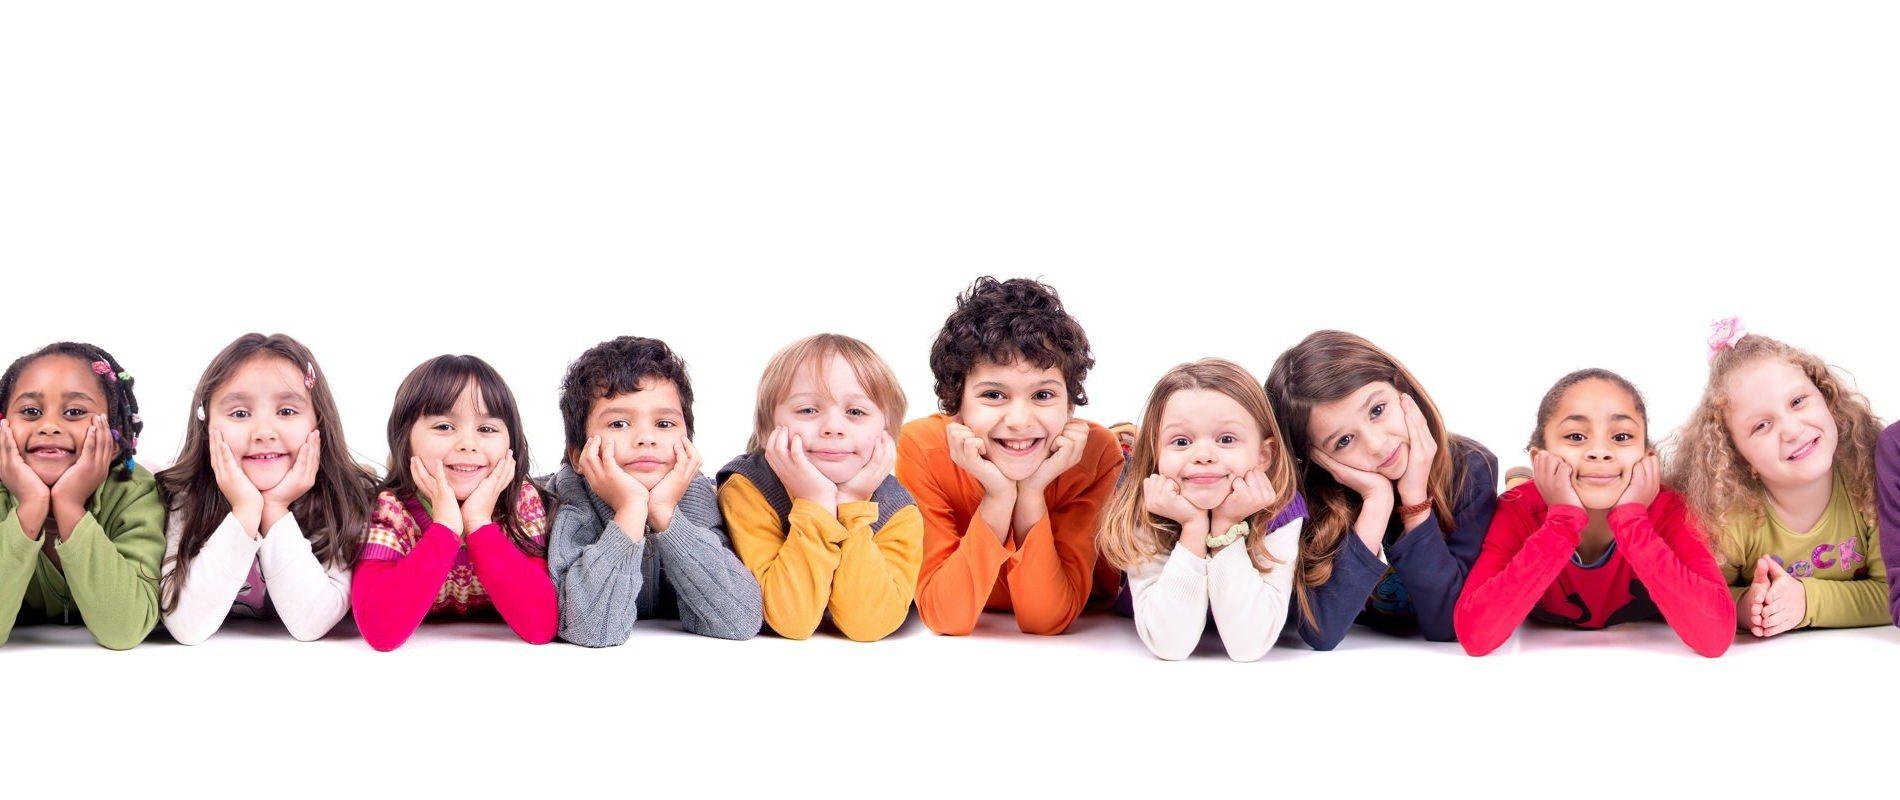 langley-children-many-children